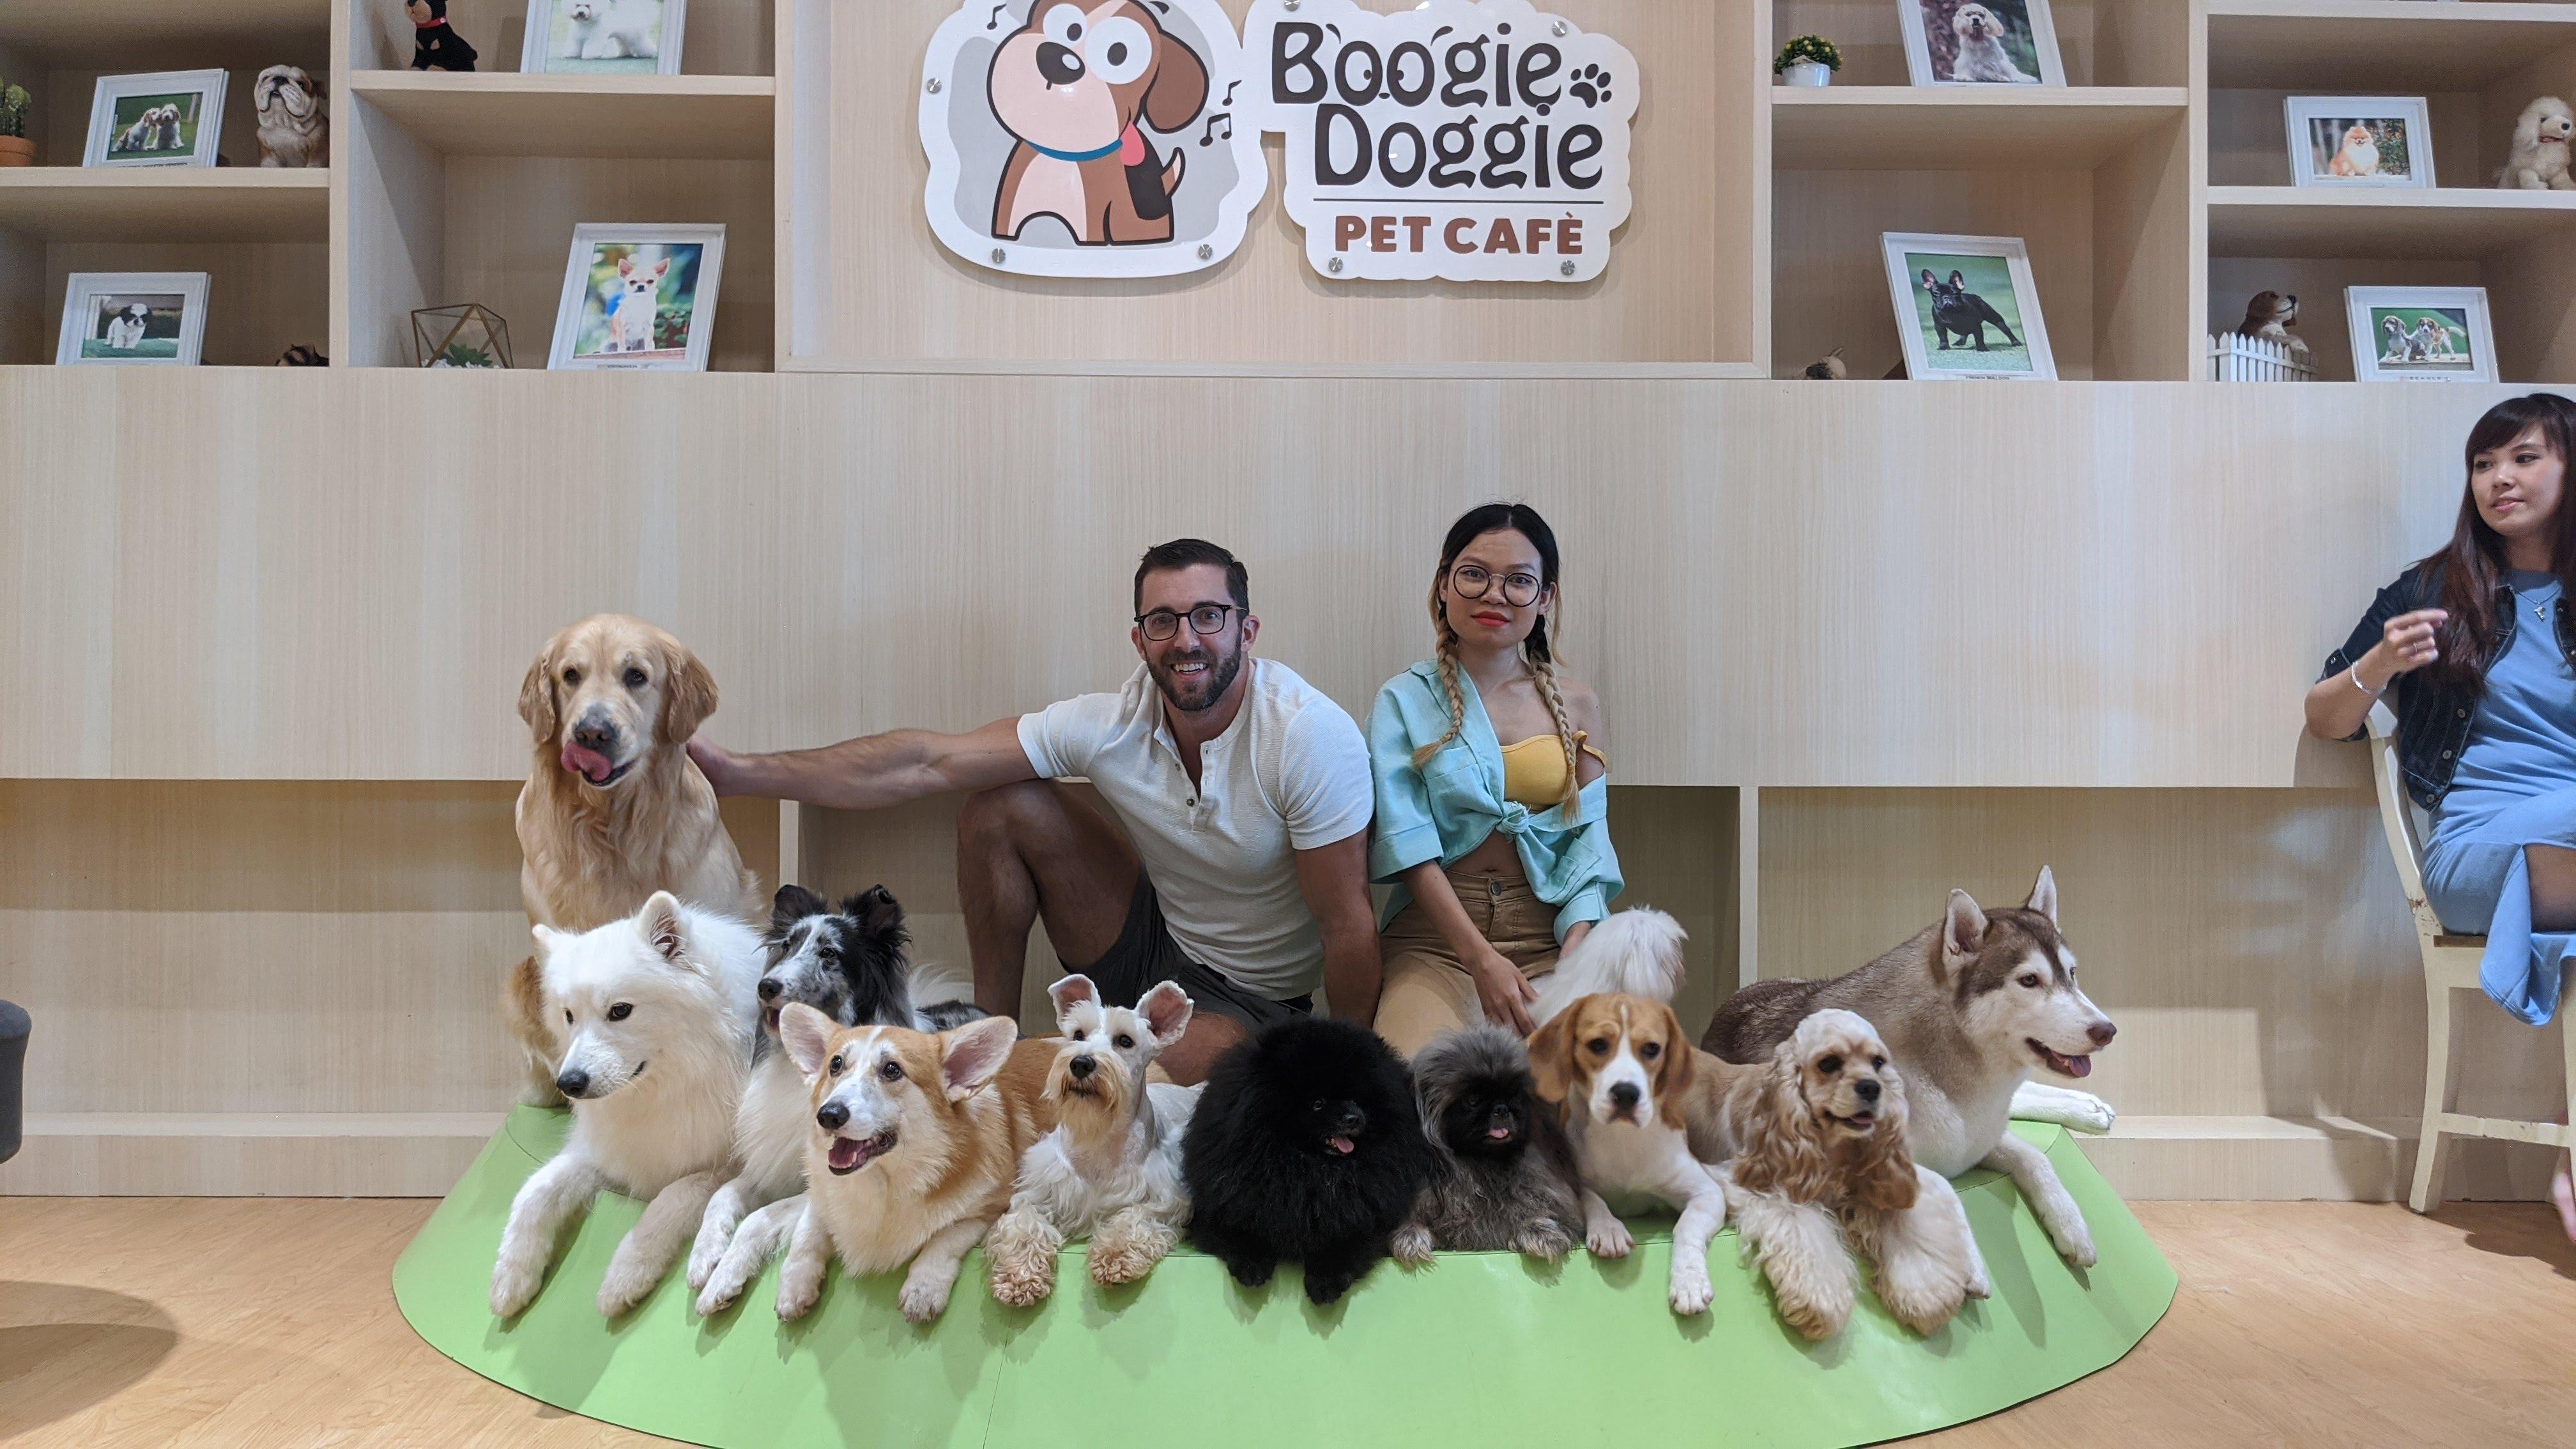 boogie doggie jakarta indonesia pet cafe